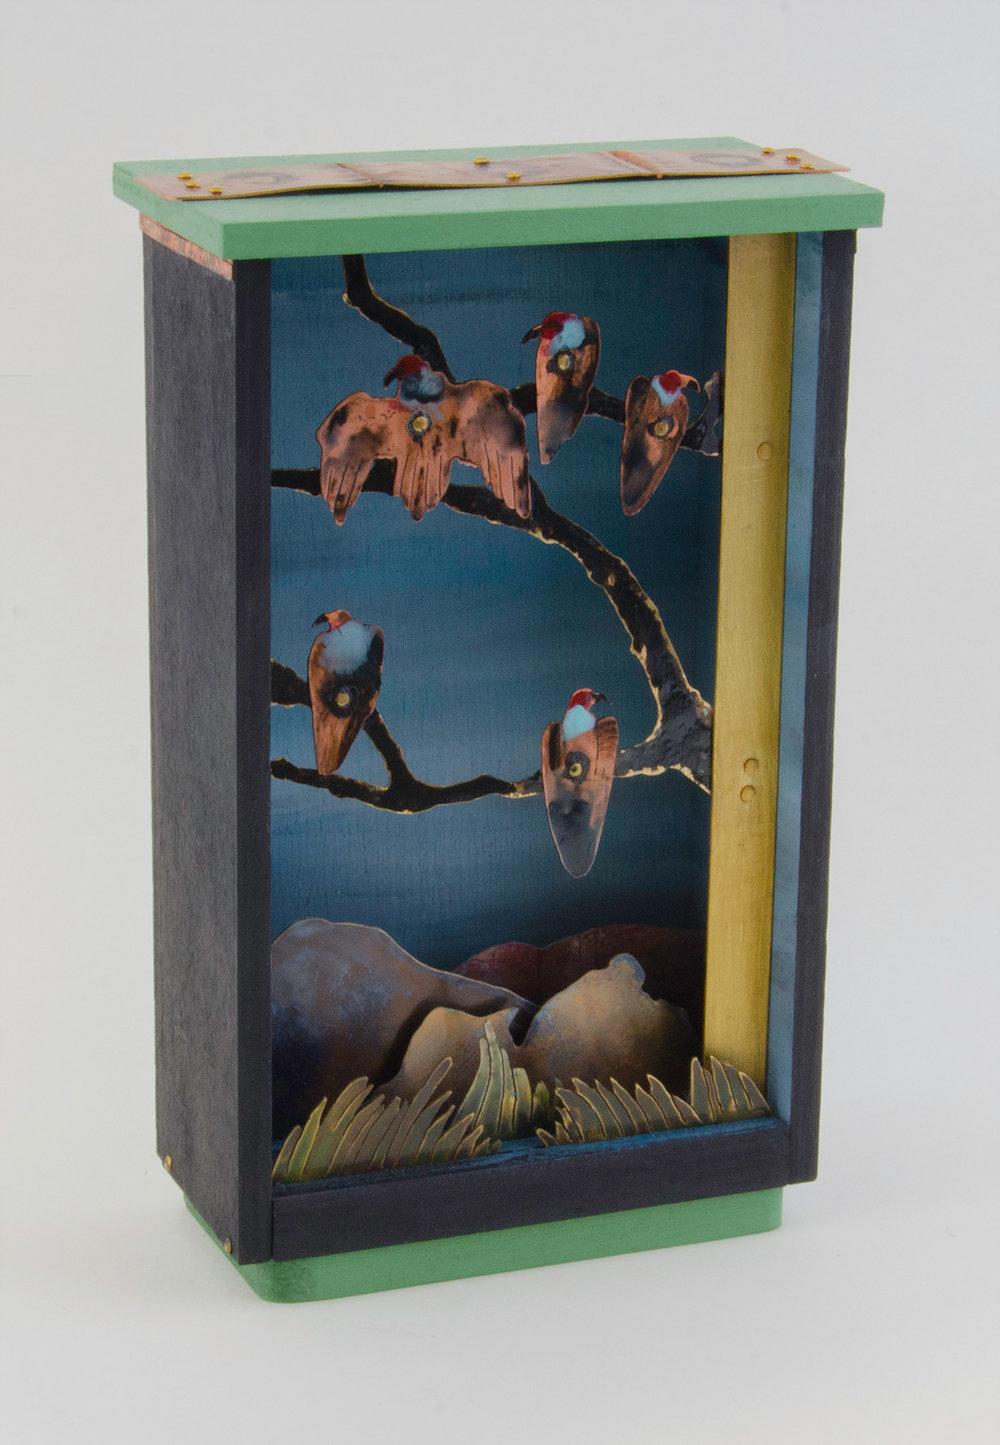 Five Vultures in a Tree - 7_ H x 3_ W x 2_D   .jpg_; filename_=UTF-8''Five Vultures in a Tree - 7_ H x 3_ W x 2_D    (2).jpg